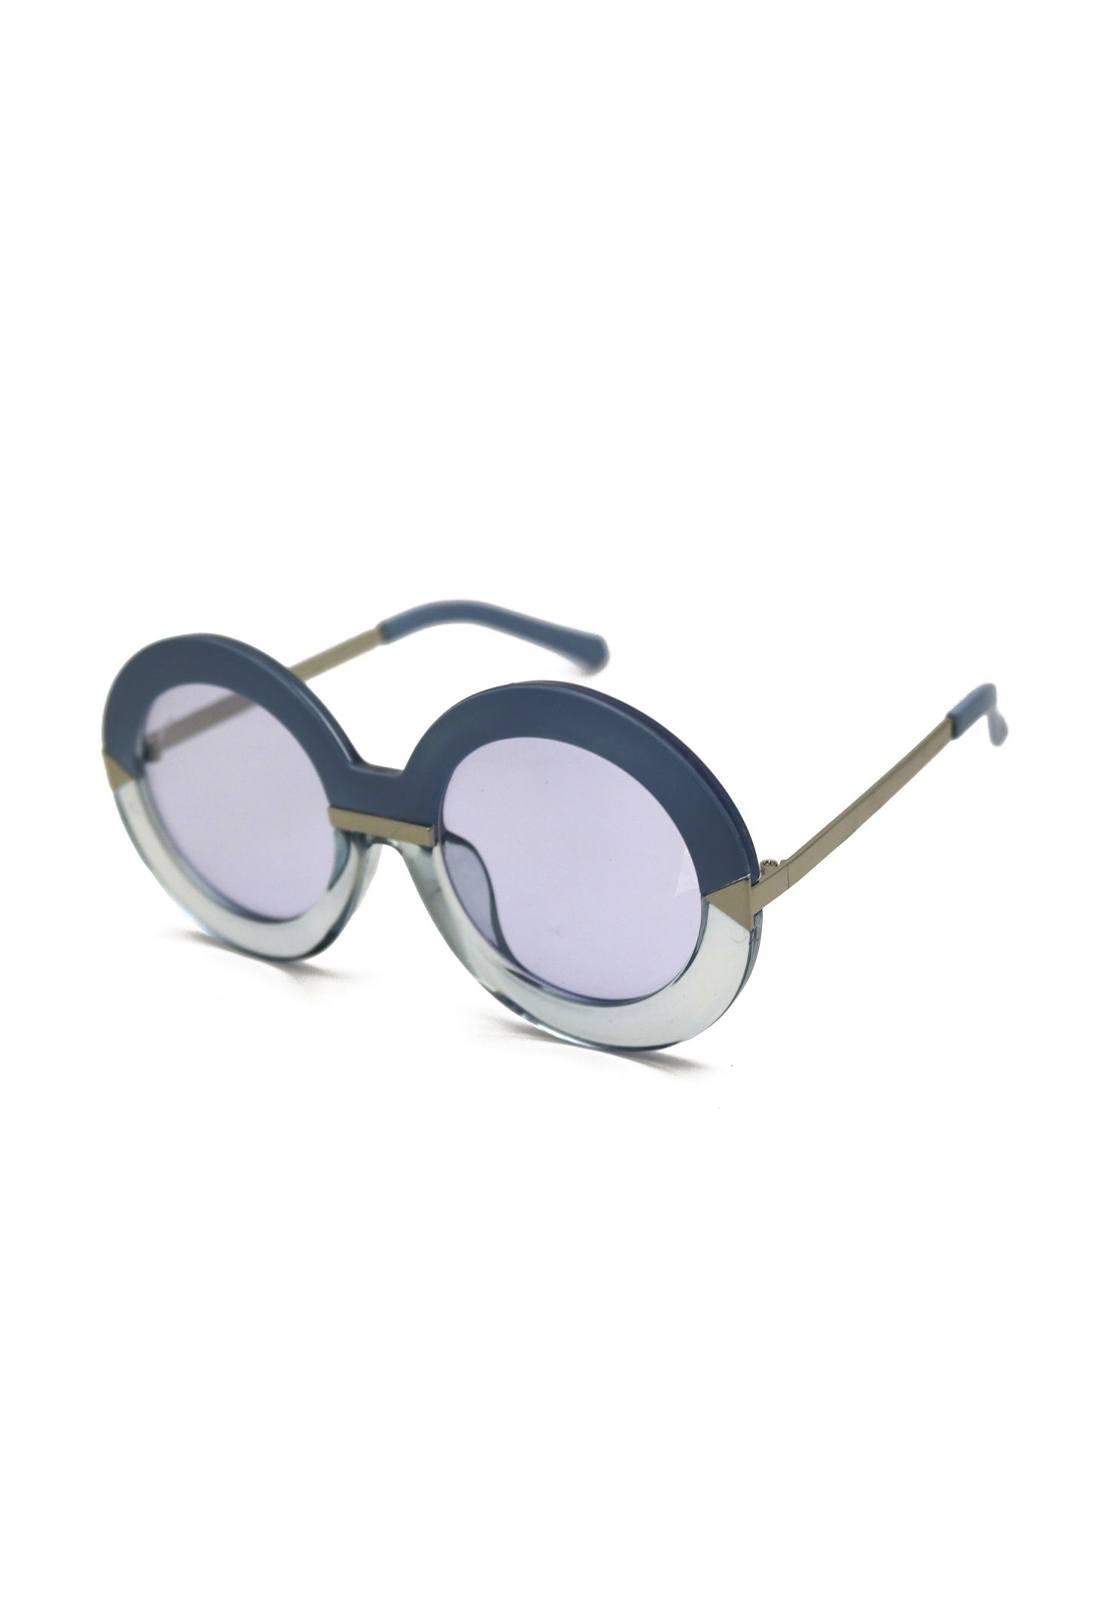 Óculos de Sol Grungetteria Twiggy Pool